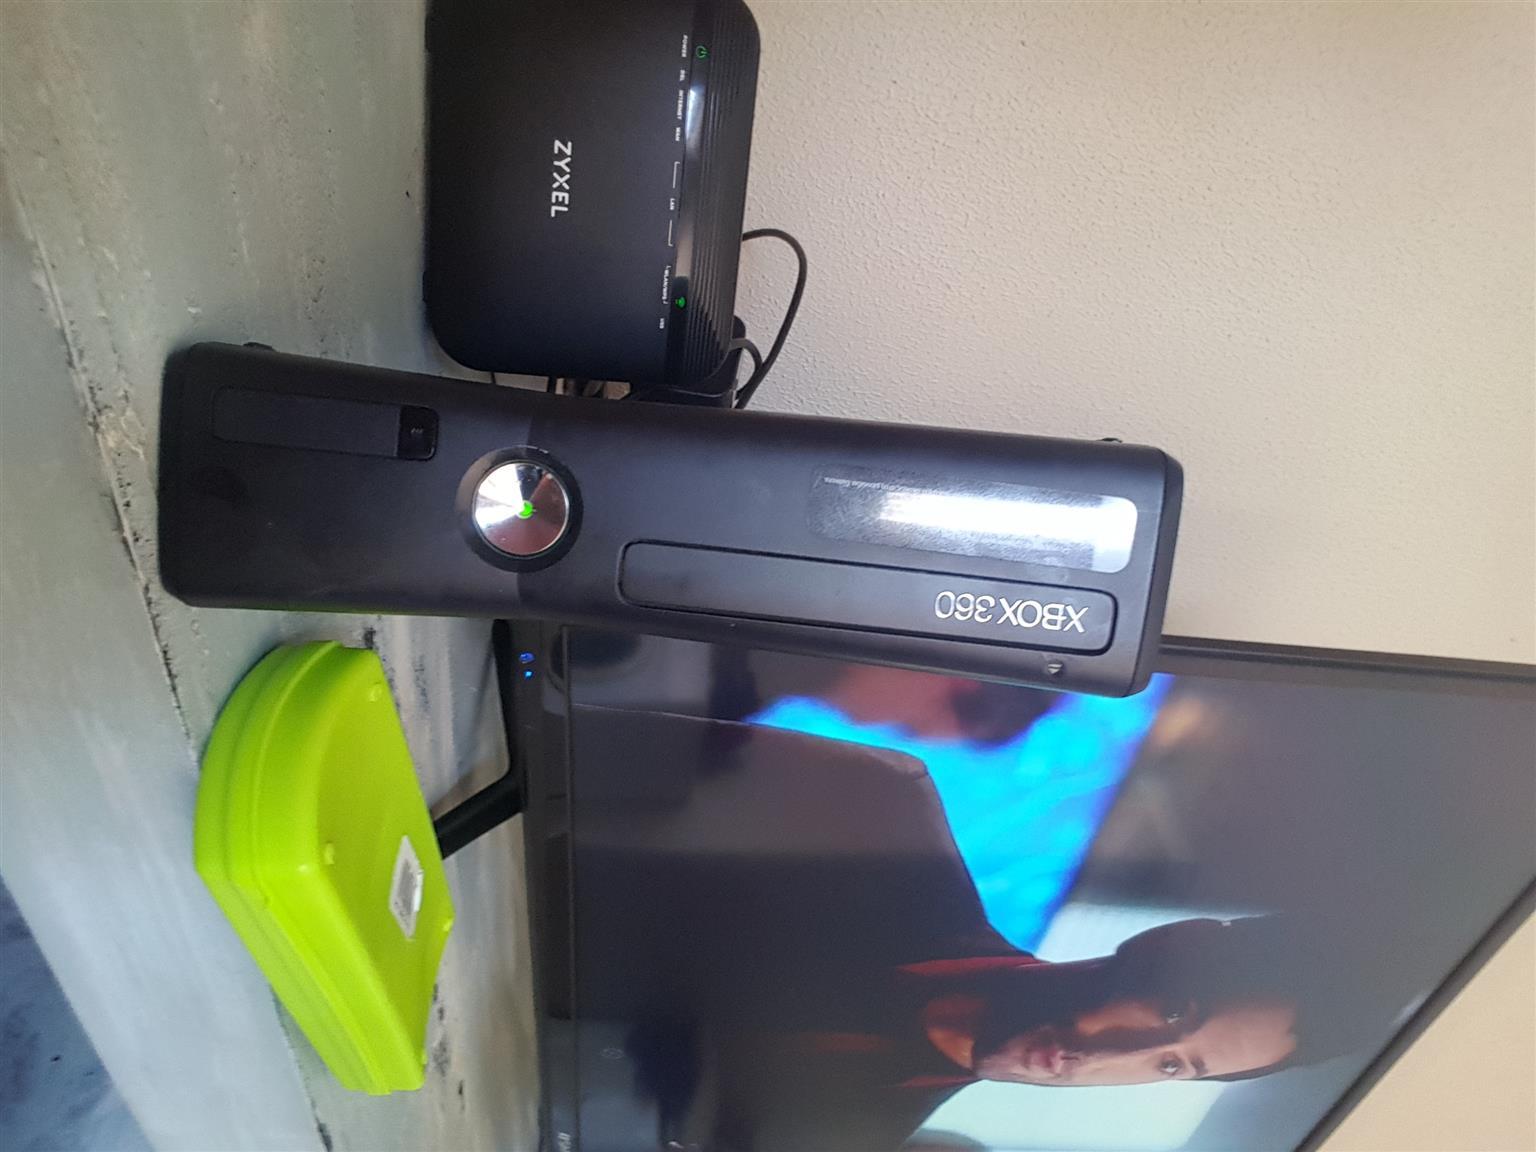 Xbox 360 S console for sale